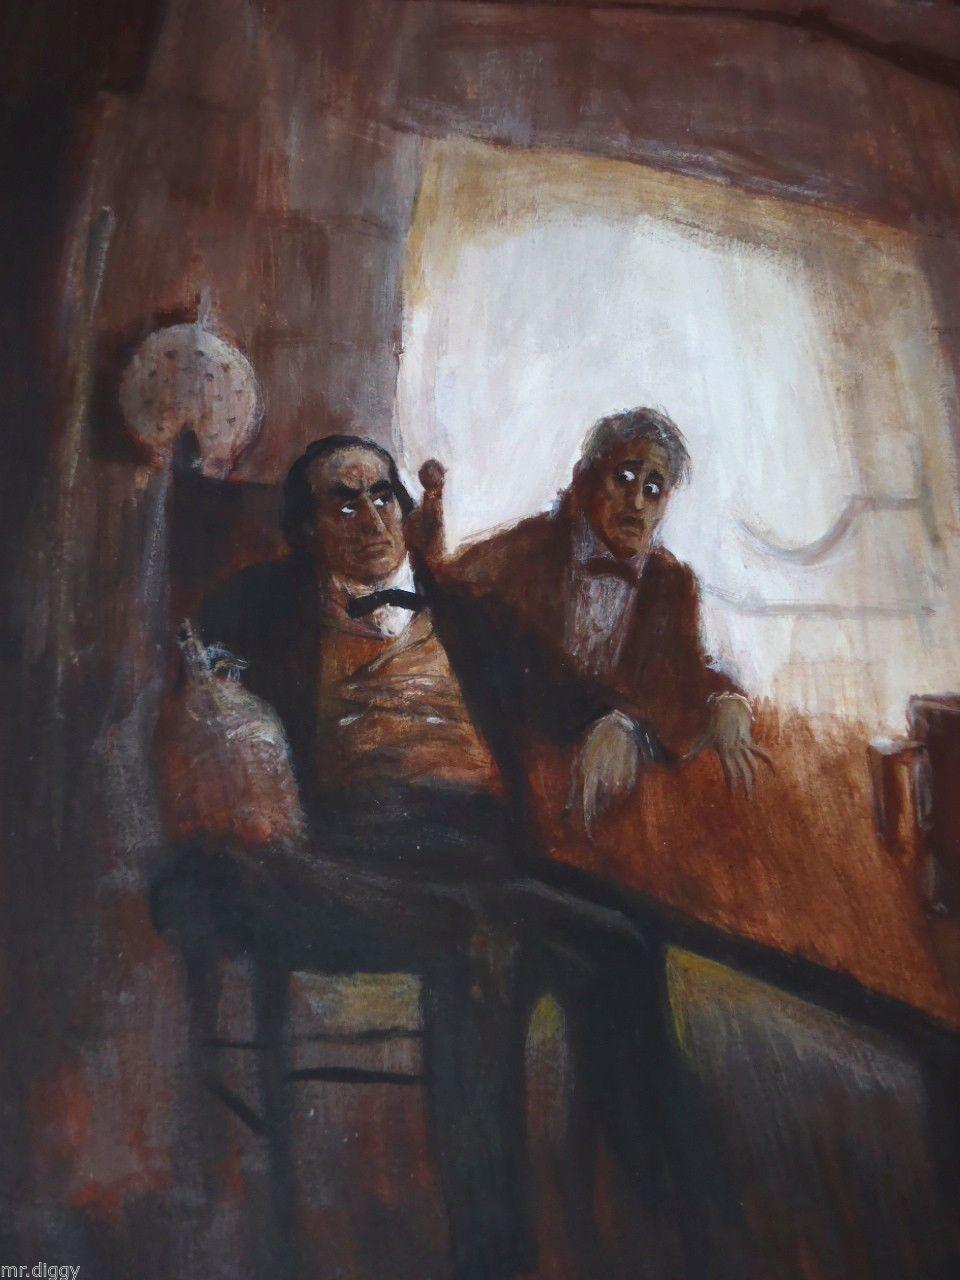 """The Devil and Daniel Webster"", 1960s illustration by Frank Larocco."